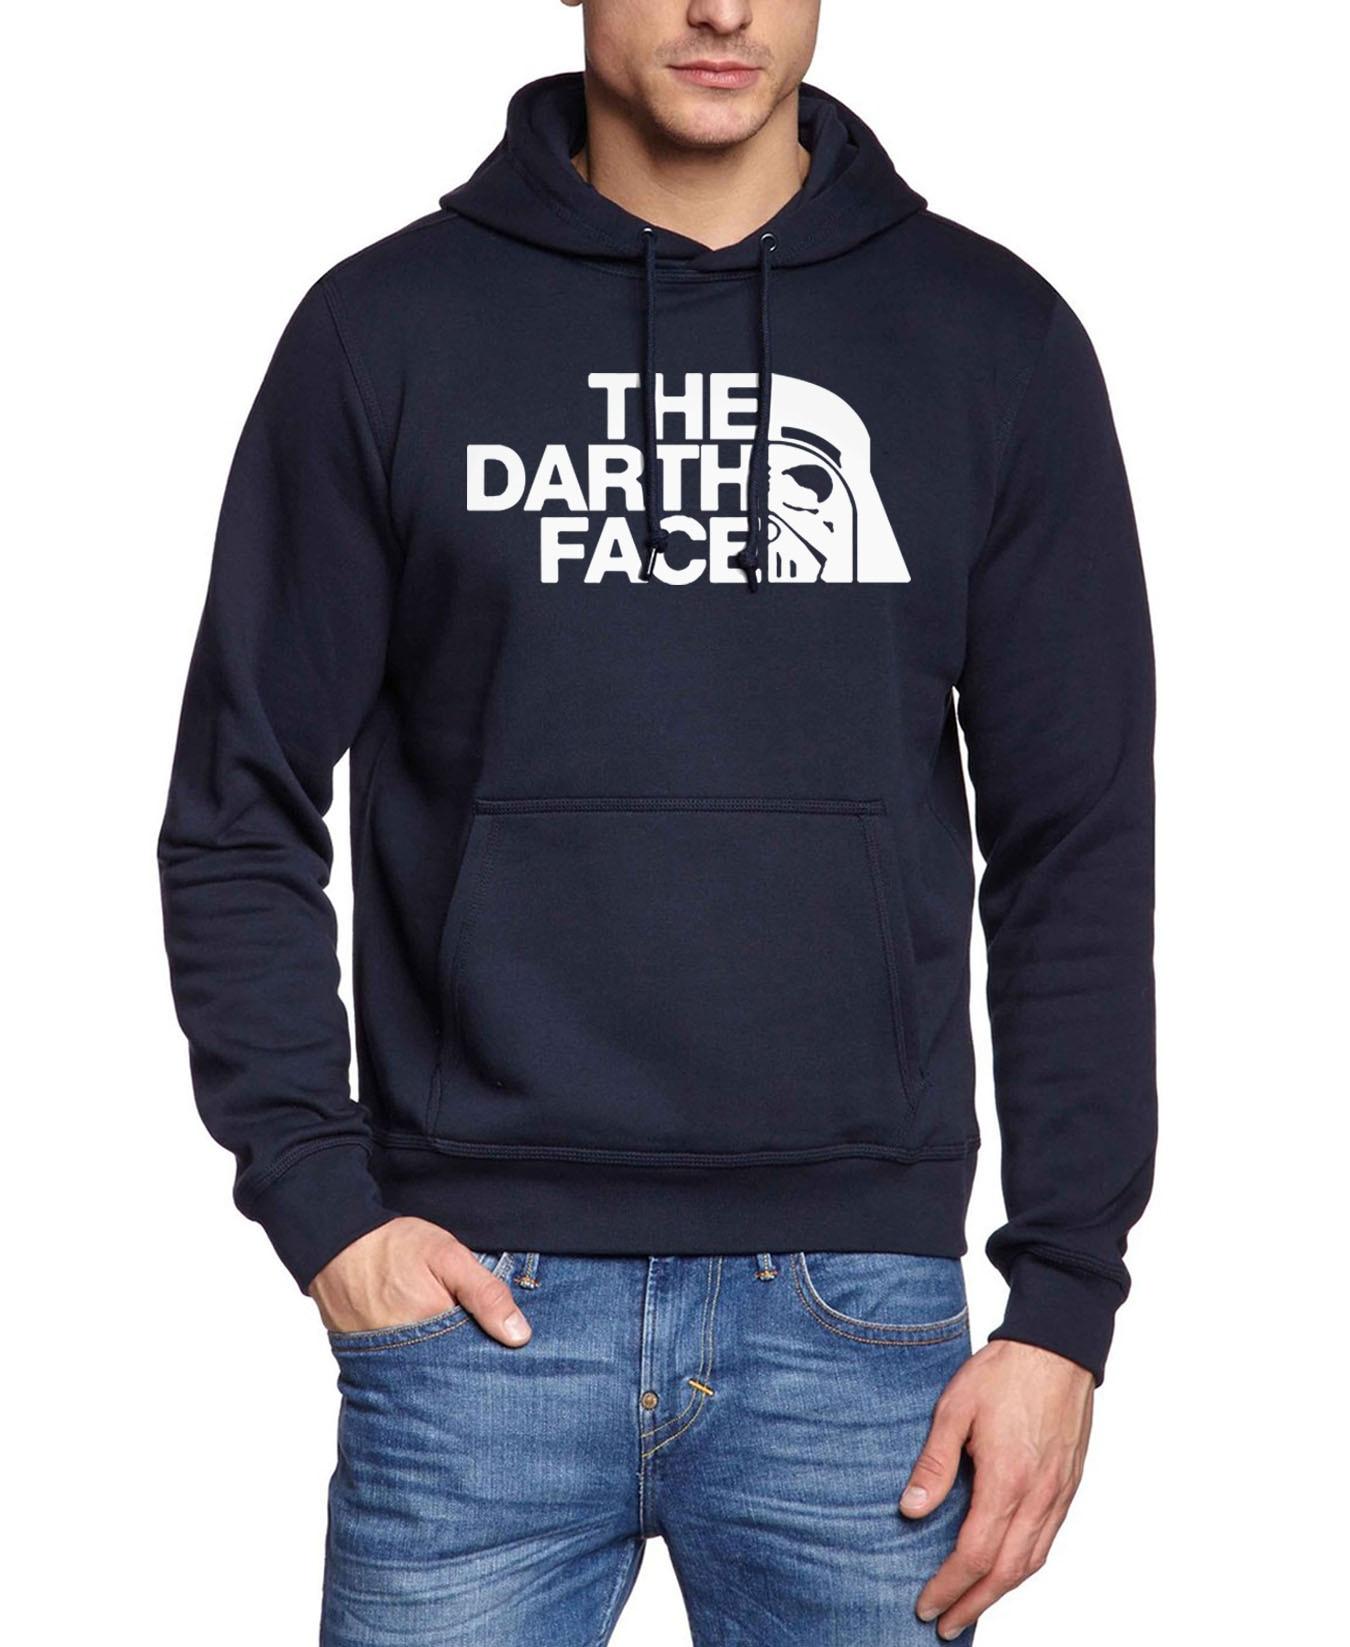 2019  star wars hooded hoodies men hip-hop fashion brand tracksuits autumn winter fleece harajuku hoodies sweatshirts